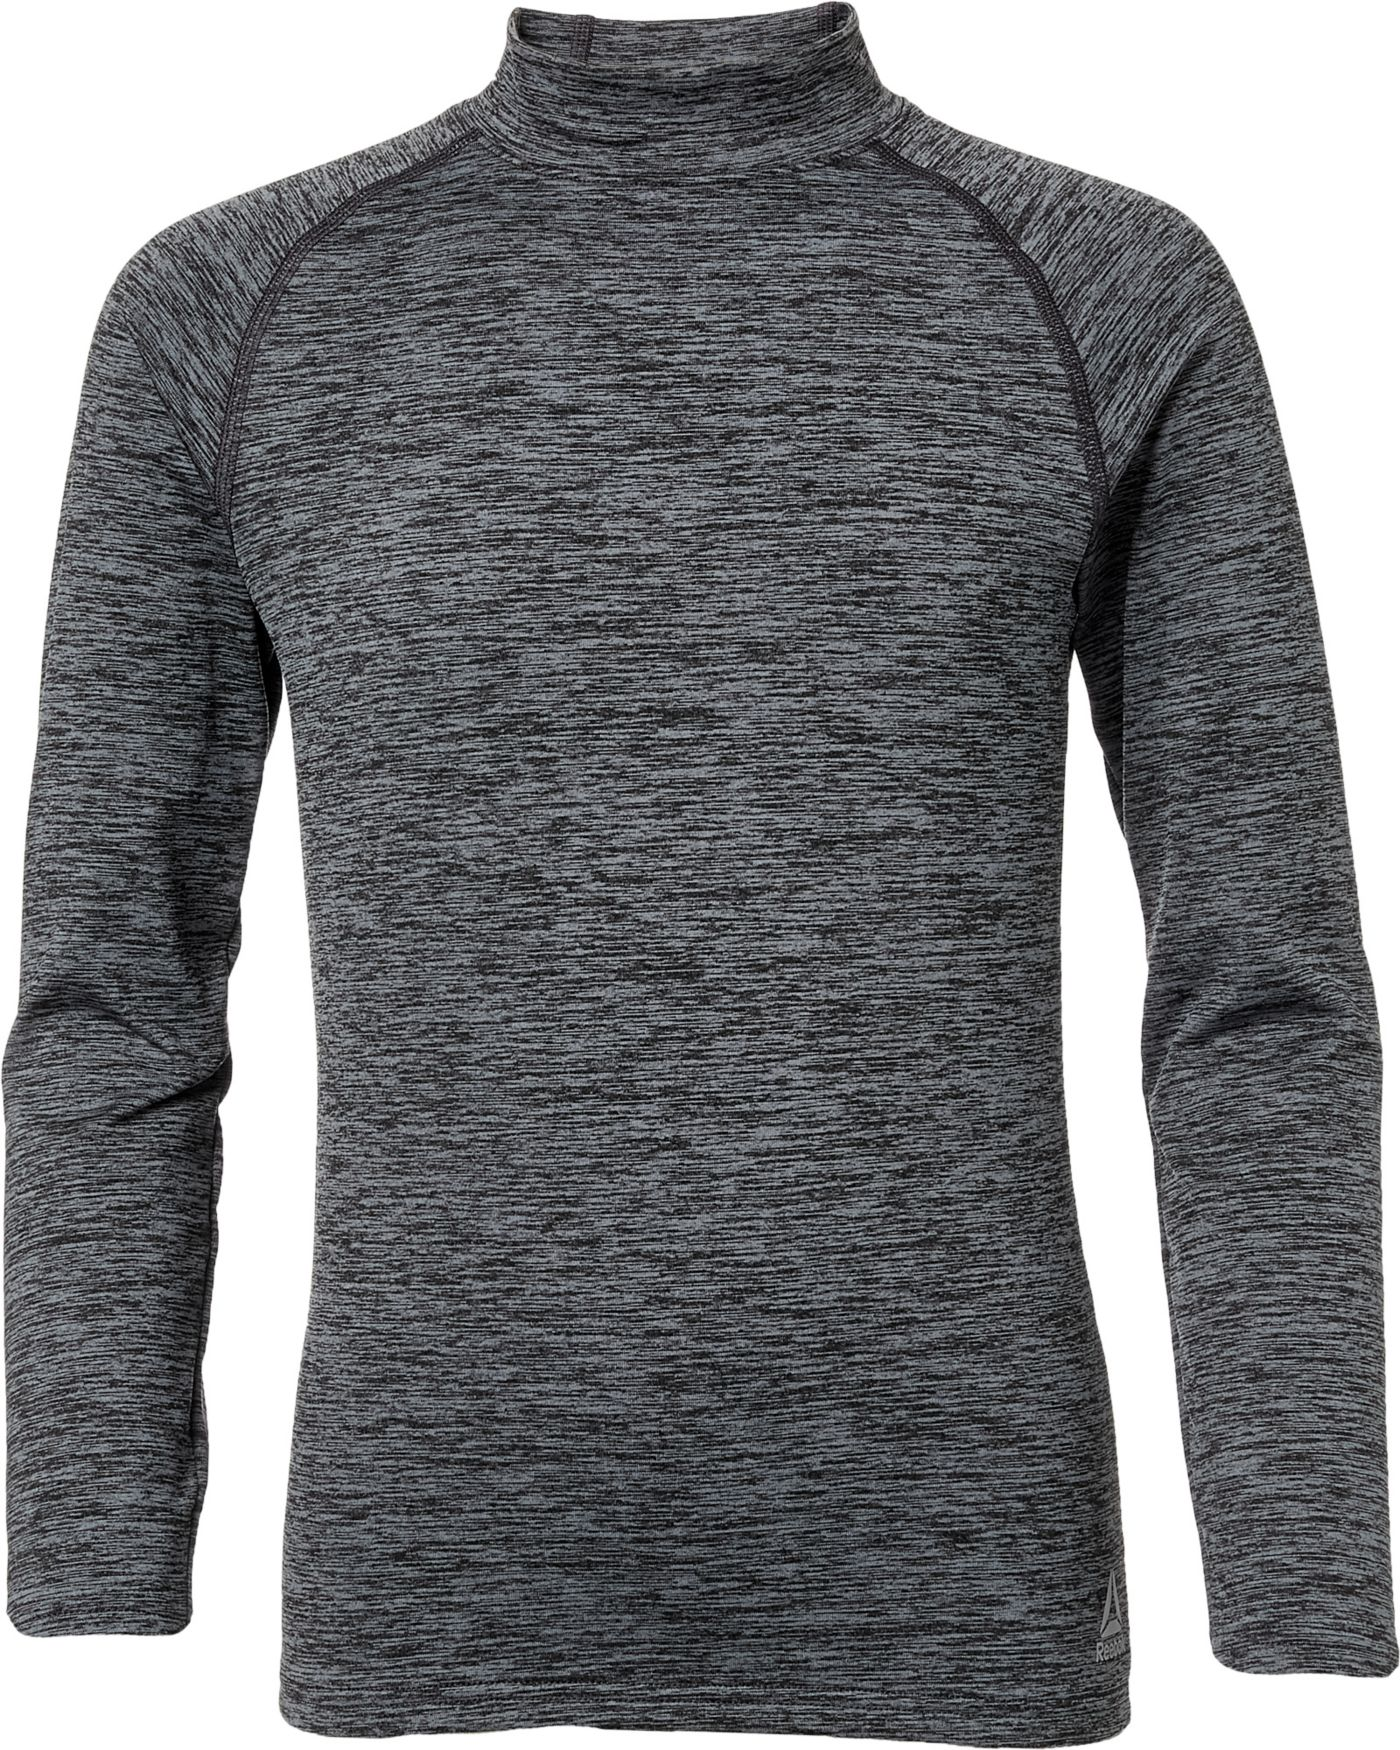 Reebok Boys' Cold Weather Compression Spacedye Mockneck Long Sleeve Shirt